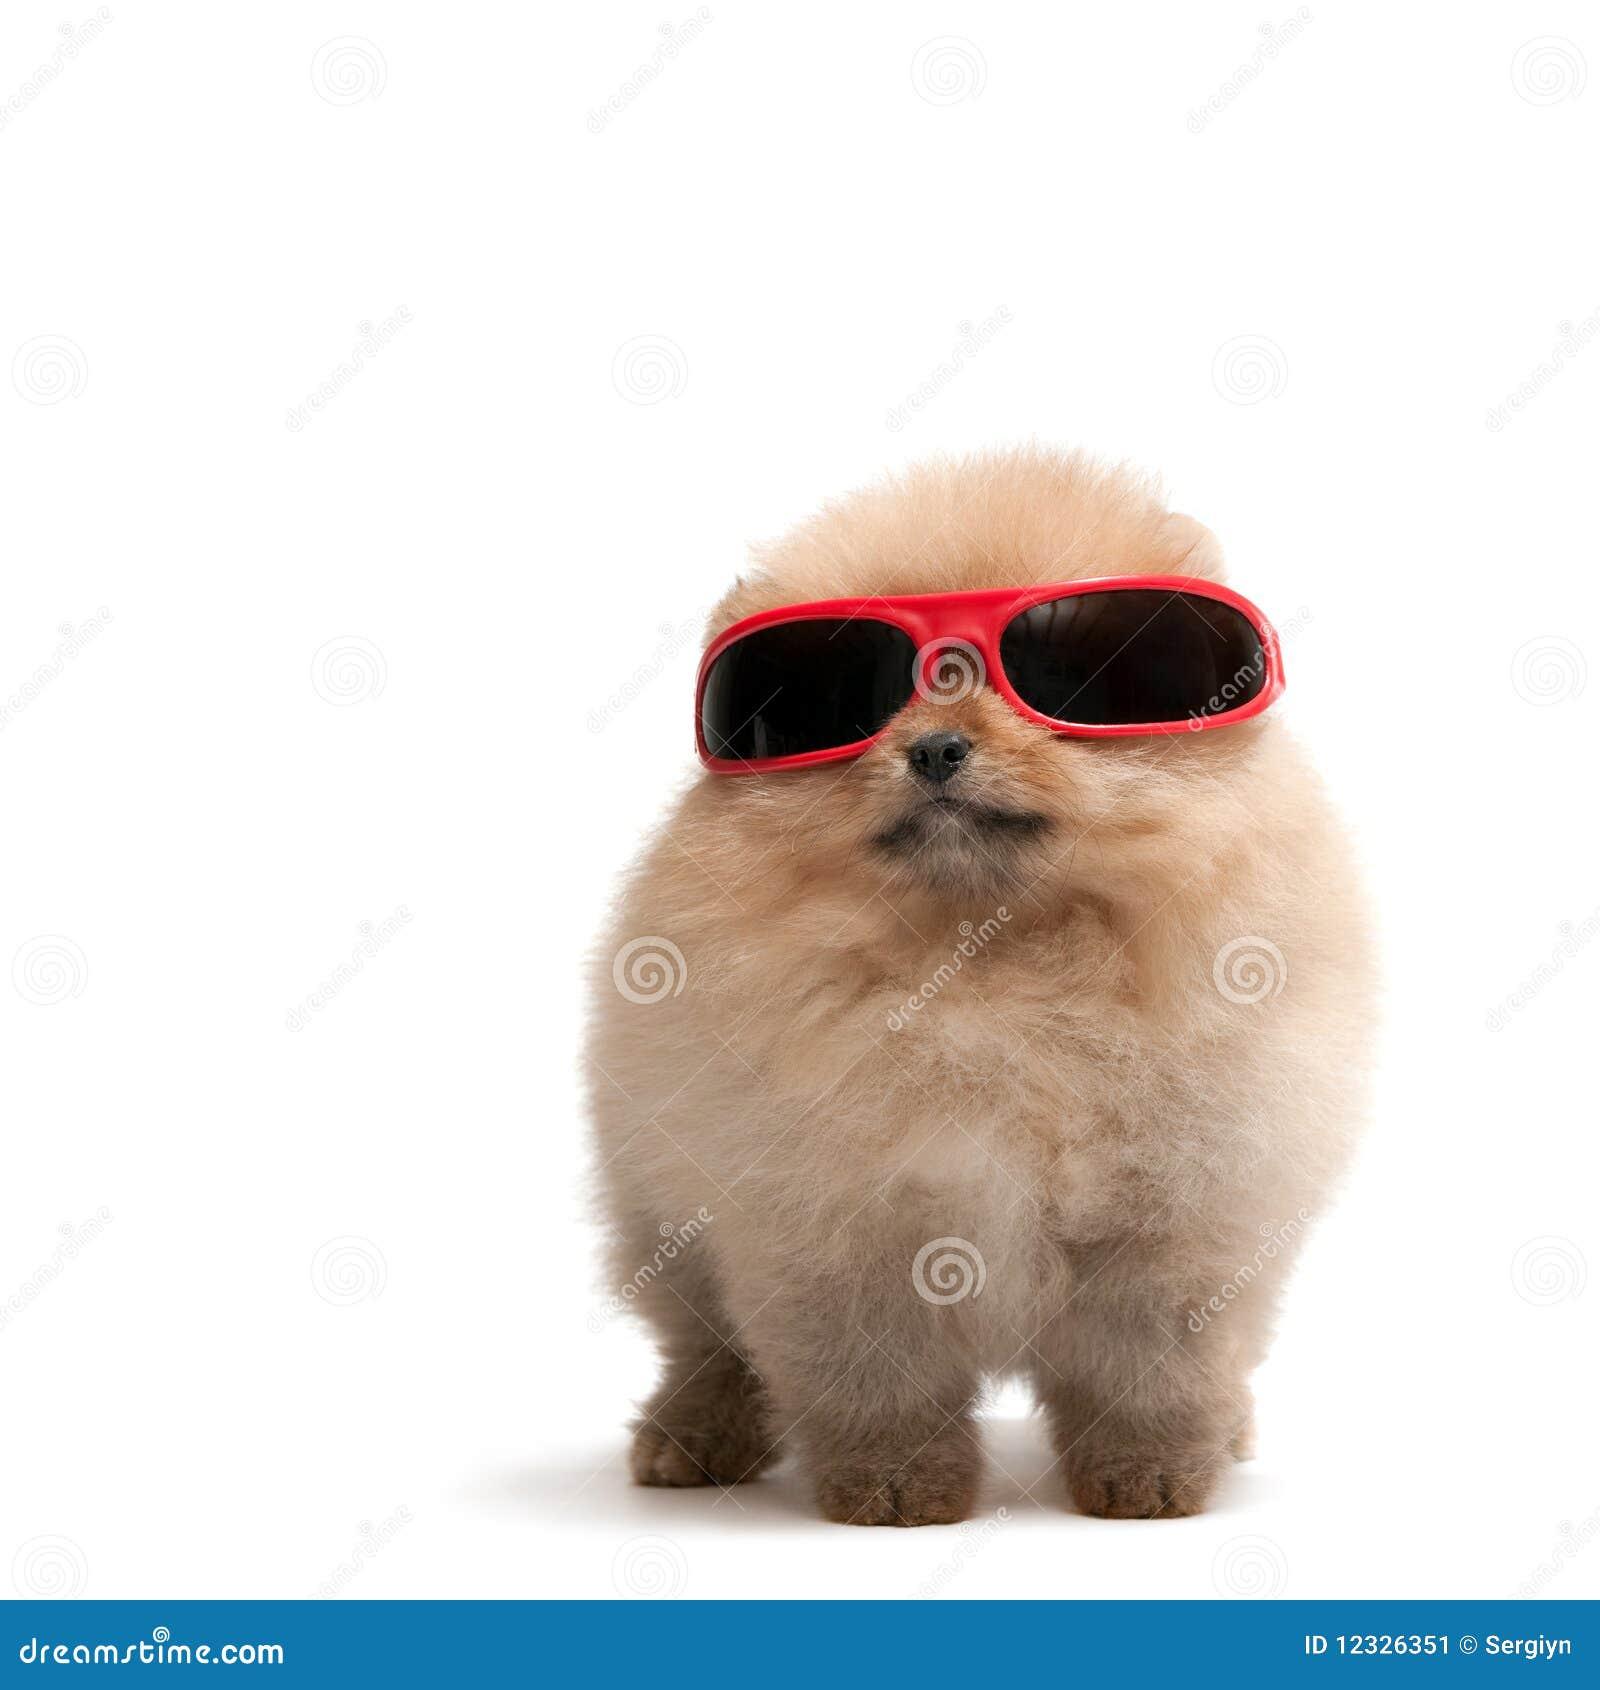 bee26c4a9d απομονωμένα pomeranian spitz γυαλιά ηλίου που φορούν το λευκό. Φωτογραφία  ...